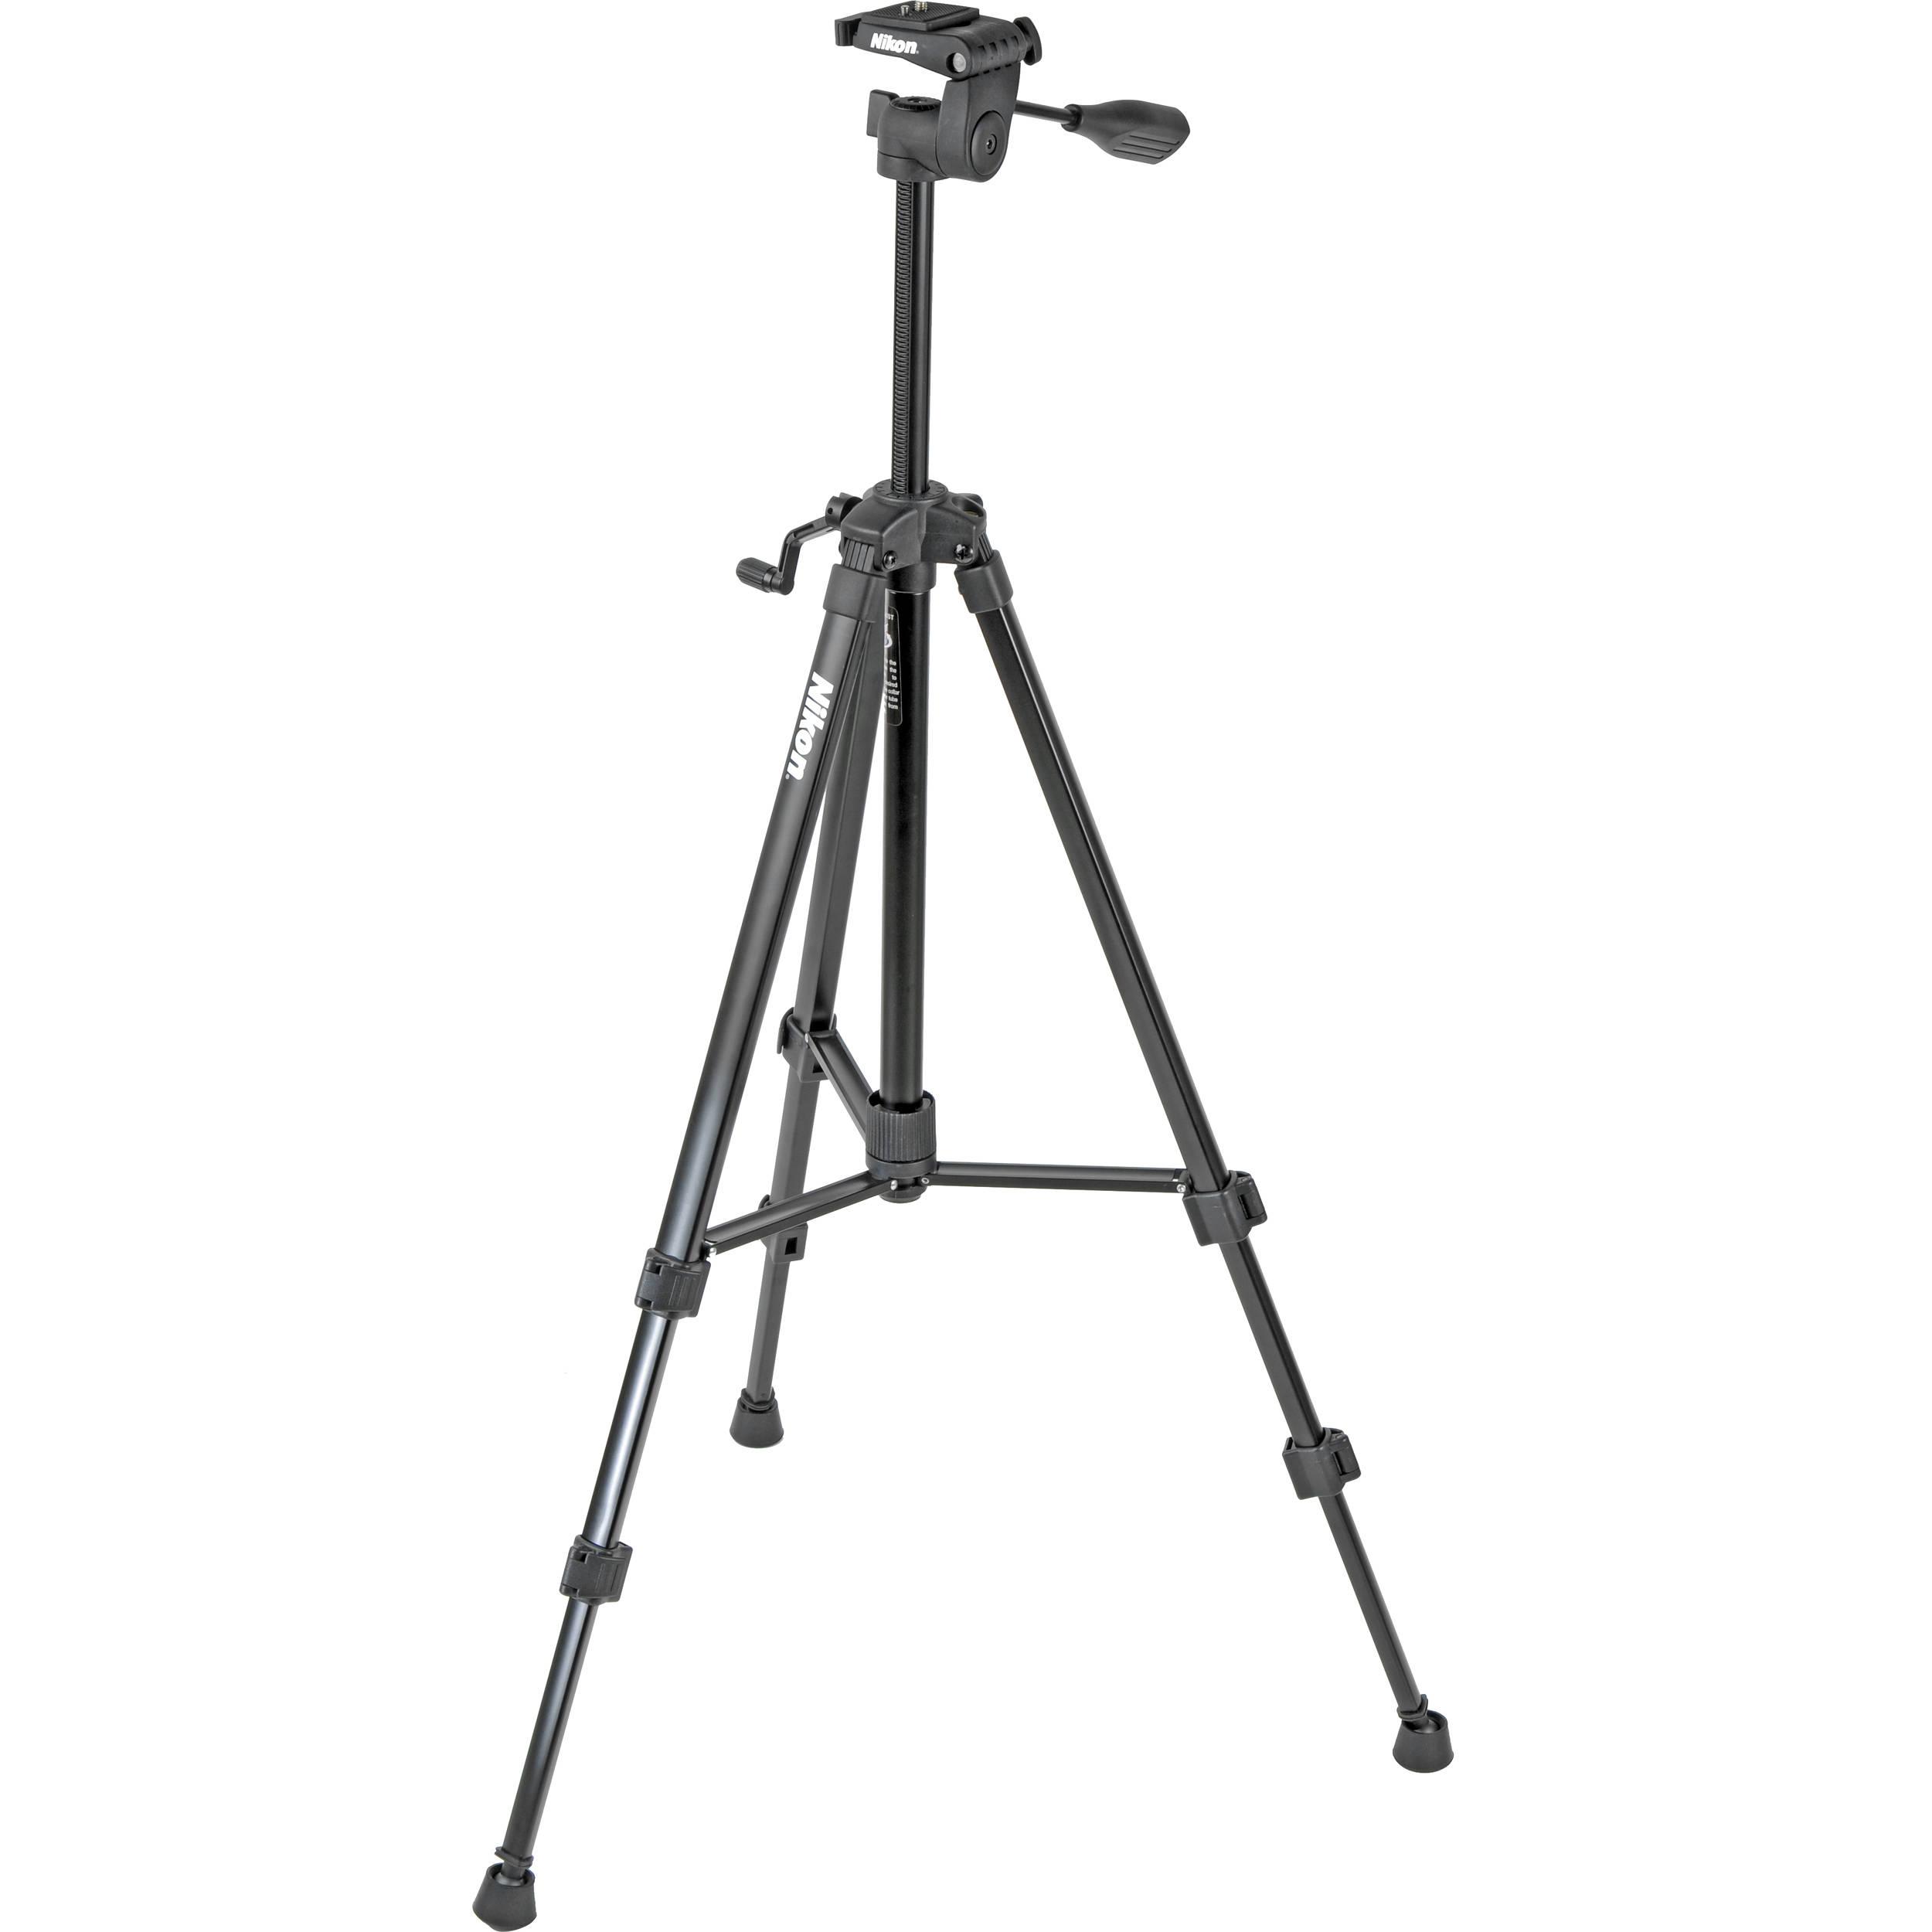 Nikon Full Size Tripod w/ Quick Release 3-Way Head (Black) 847